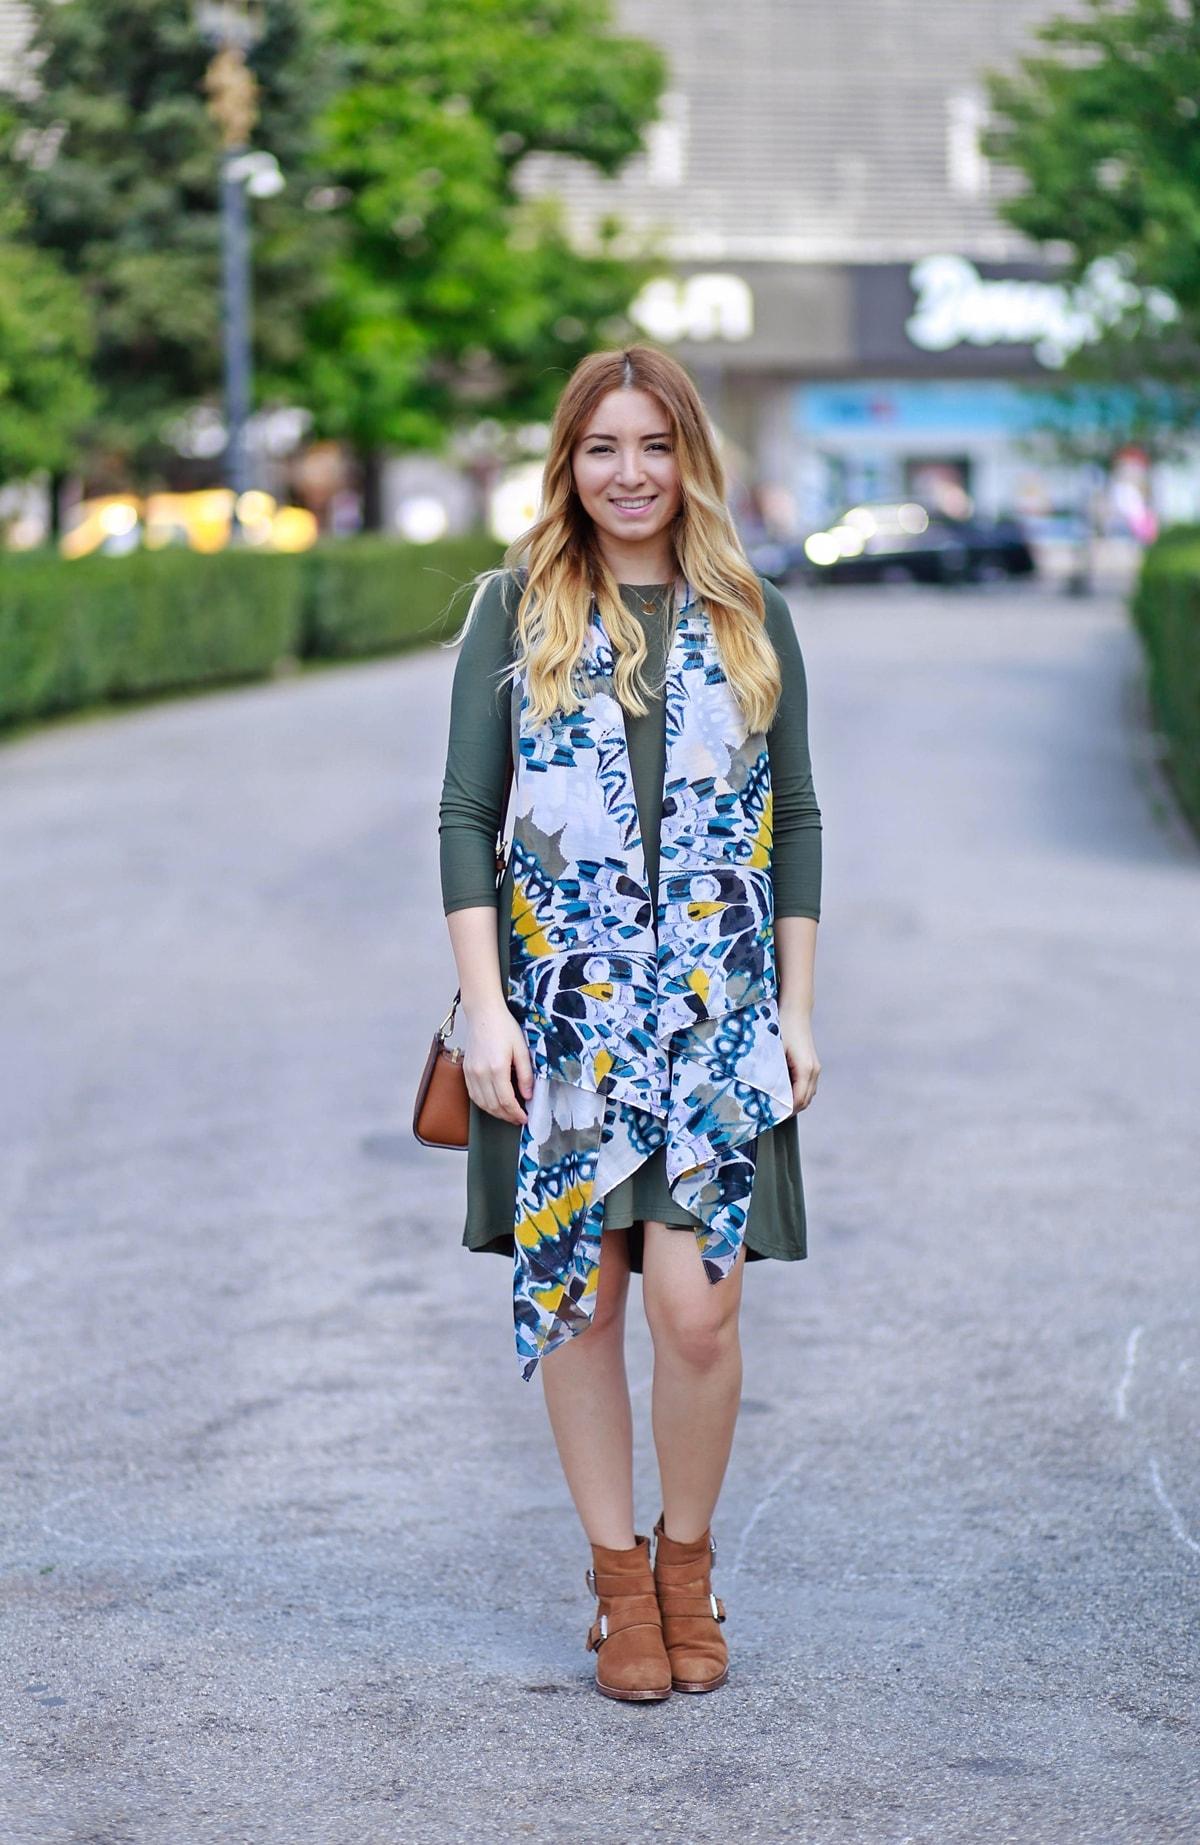 Andreea Ristea blog - tinuta rochie casual, verde militar, esarfa h&m, romwe